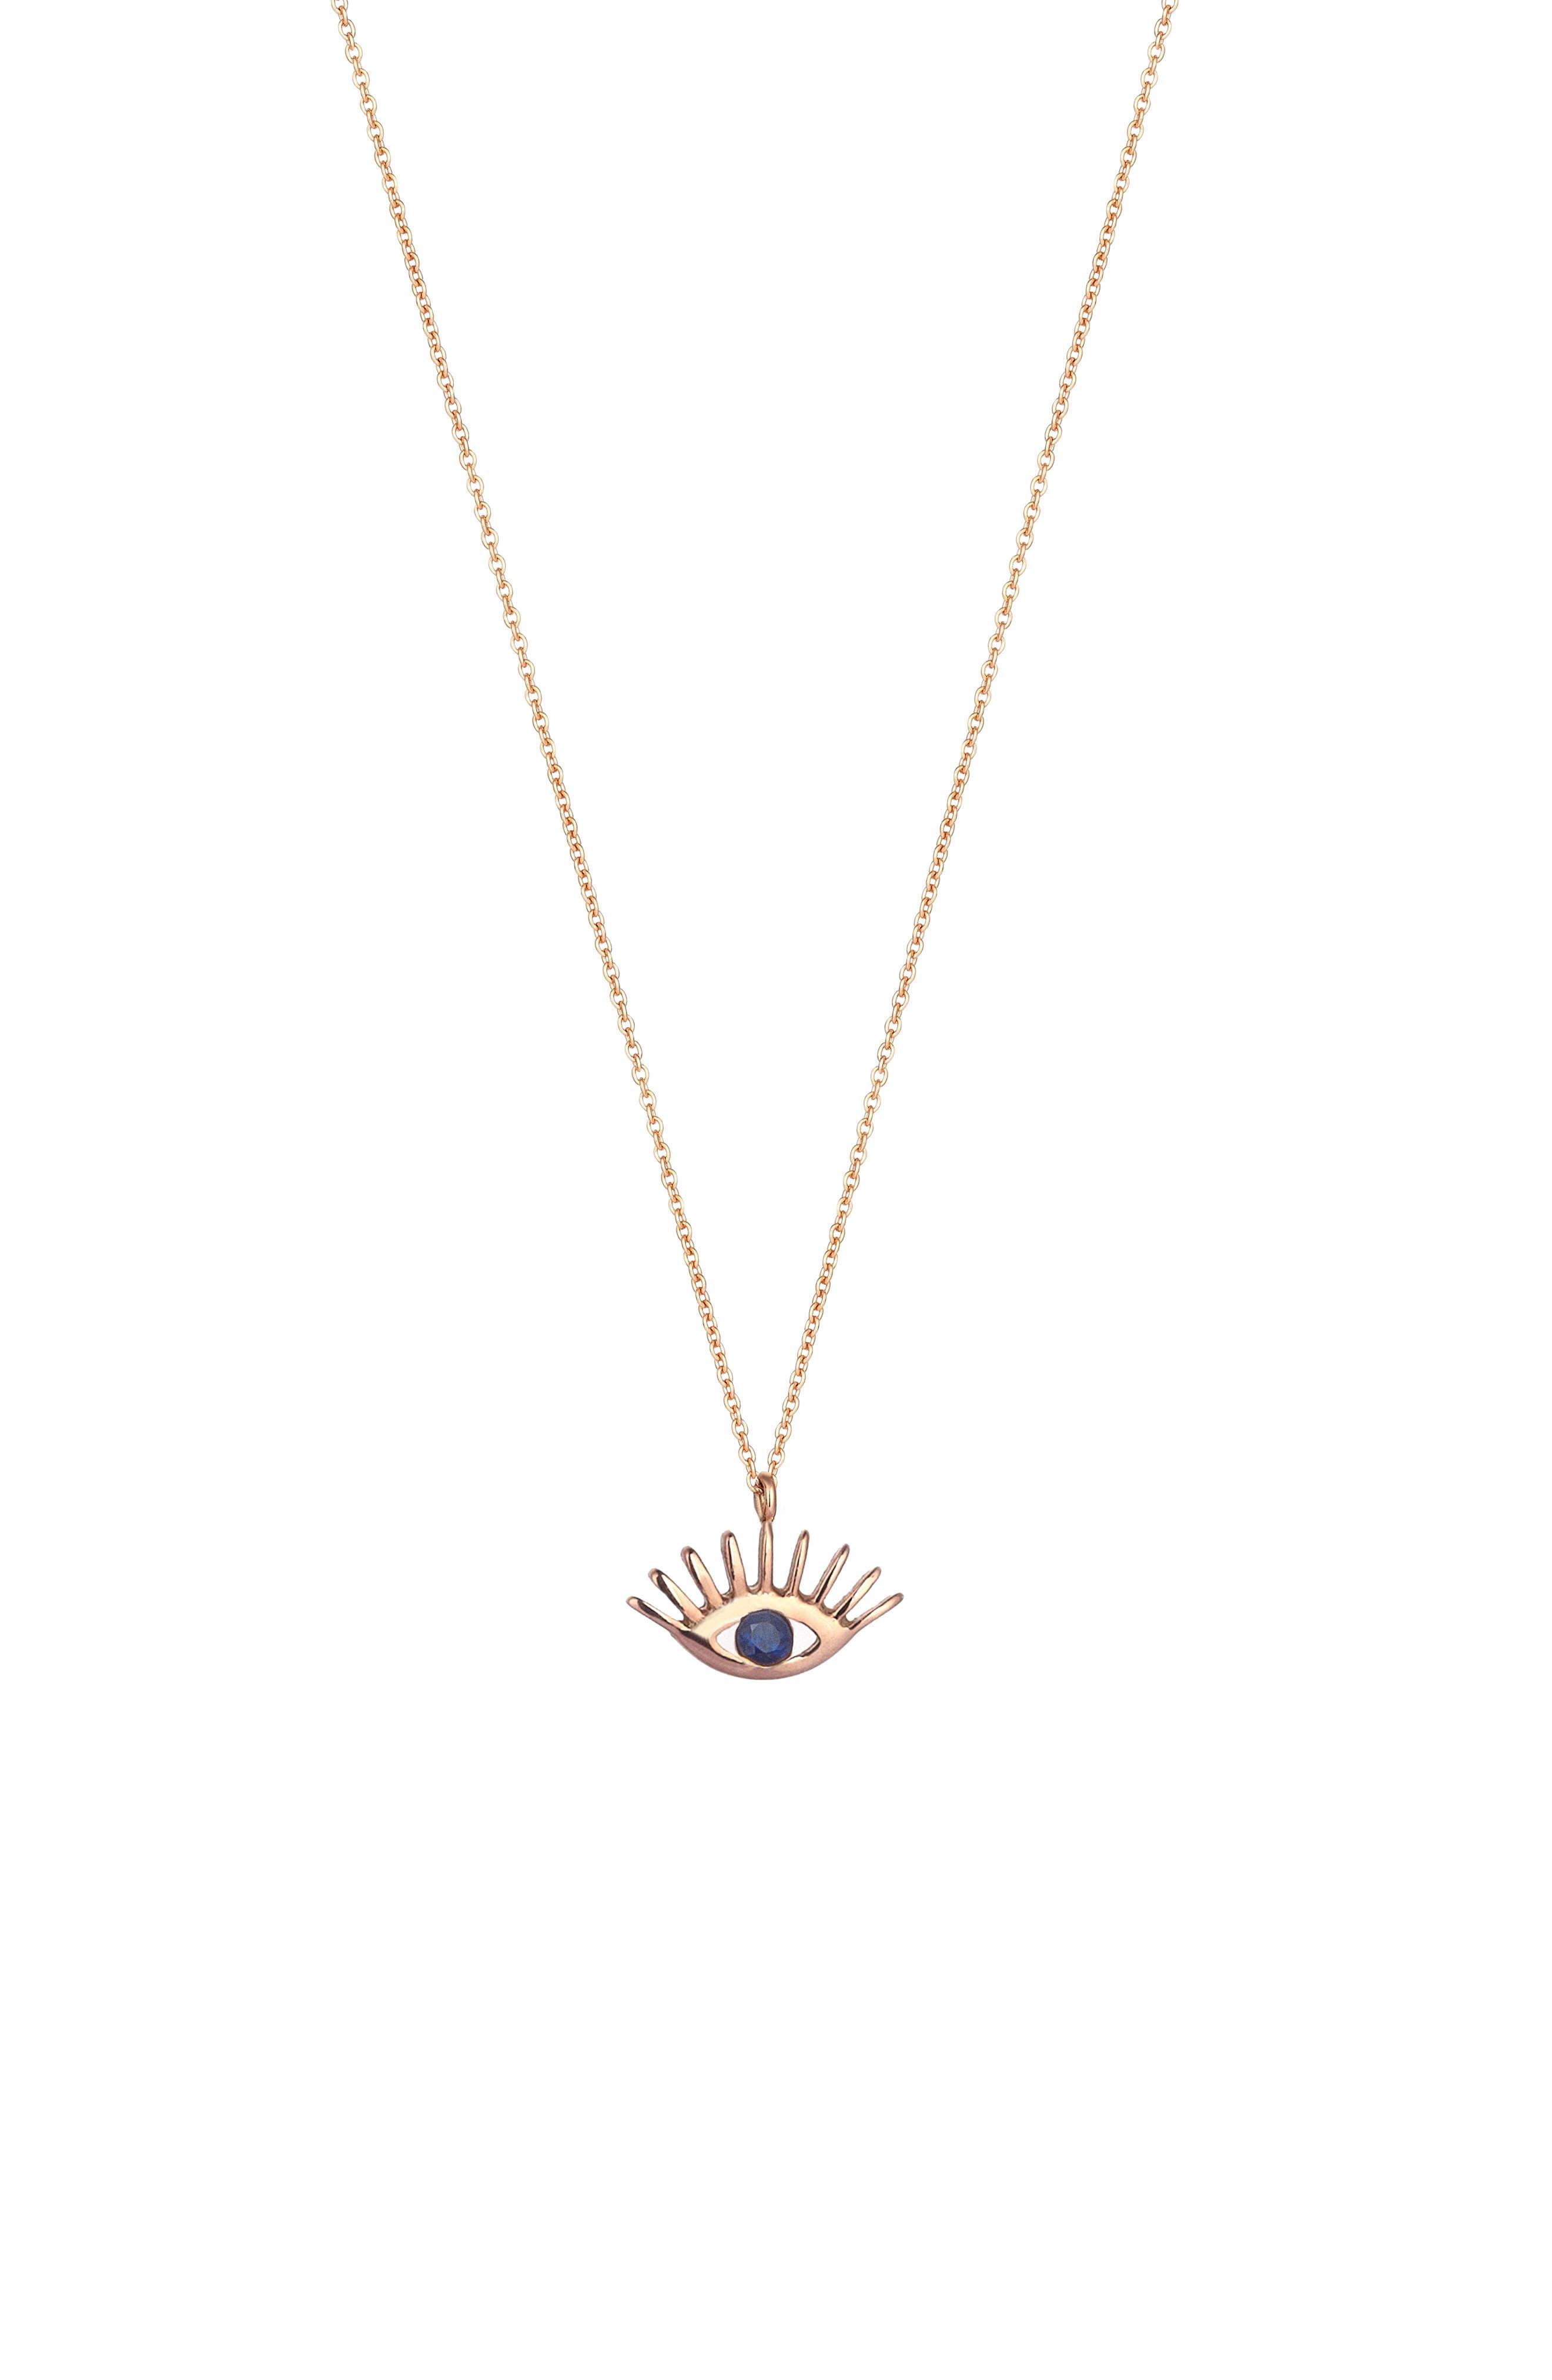 Main Image - Kismet by Milka Sapphire Pendant Necklace